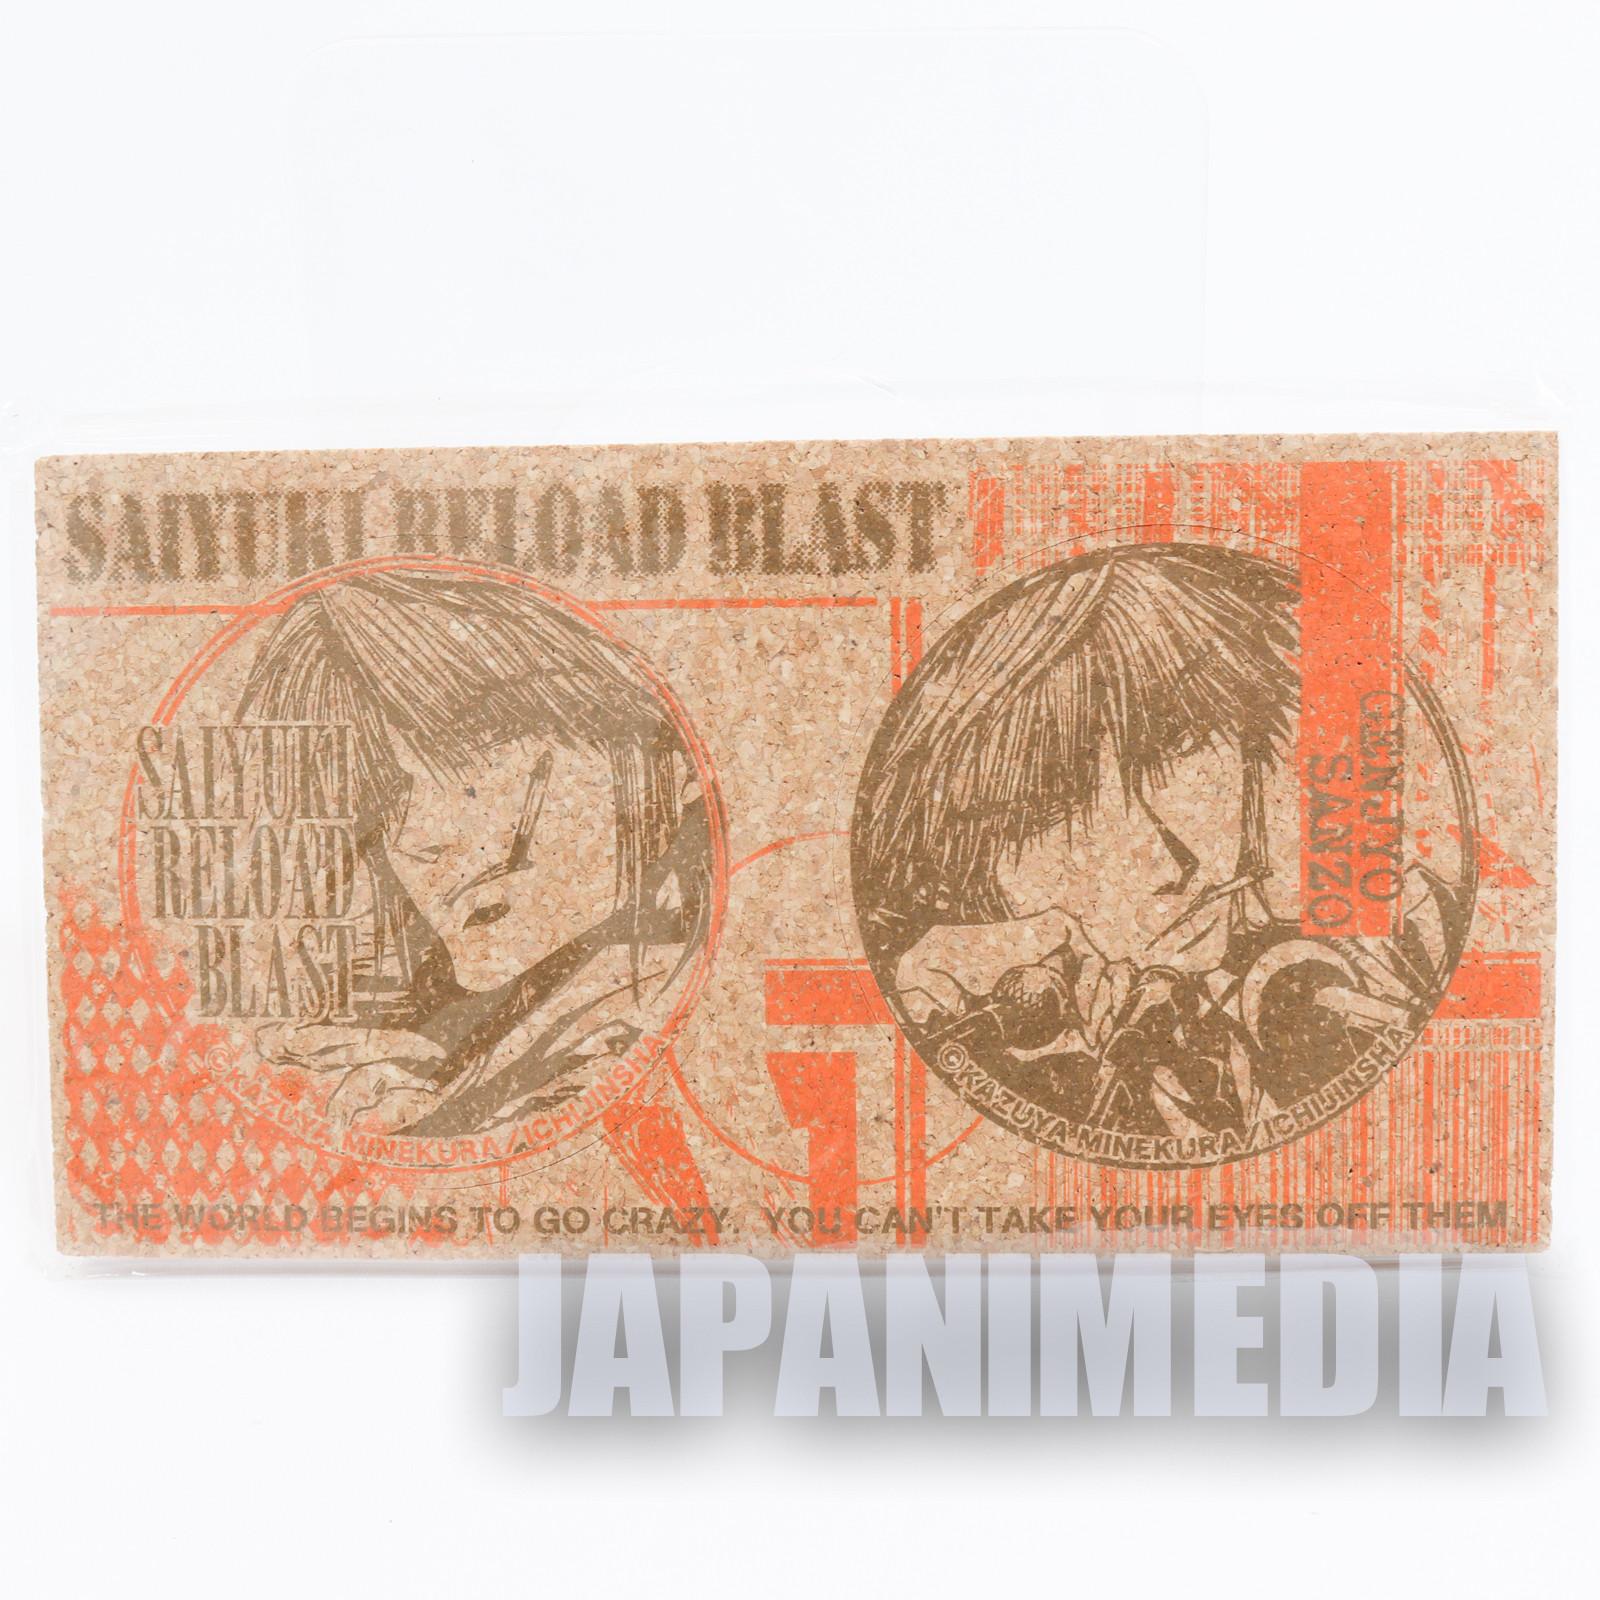 SAIYUKI Reload Blast Genjo Sanzo Cork Coasters Set Kazuya Minekura JAPAN ANIME